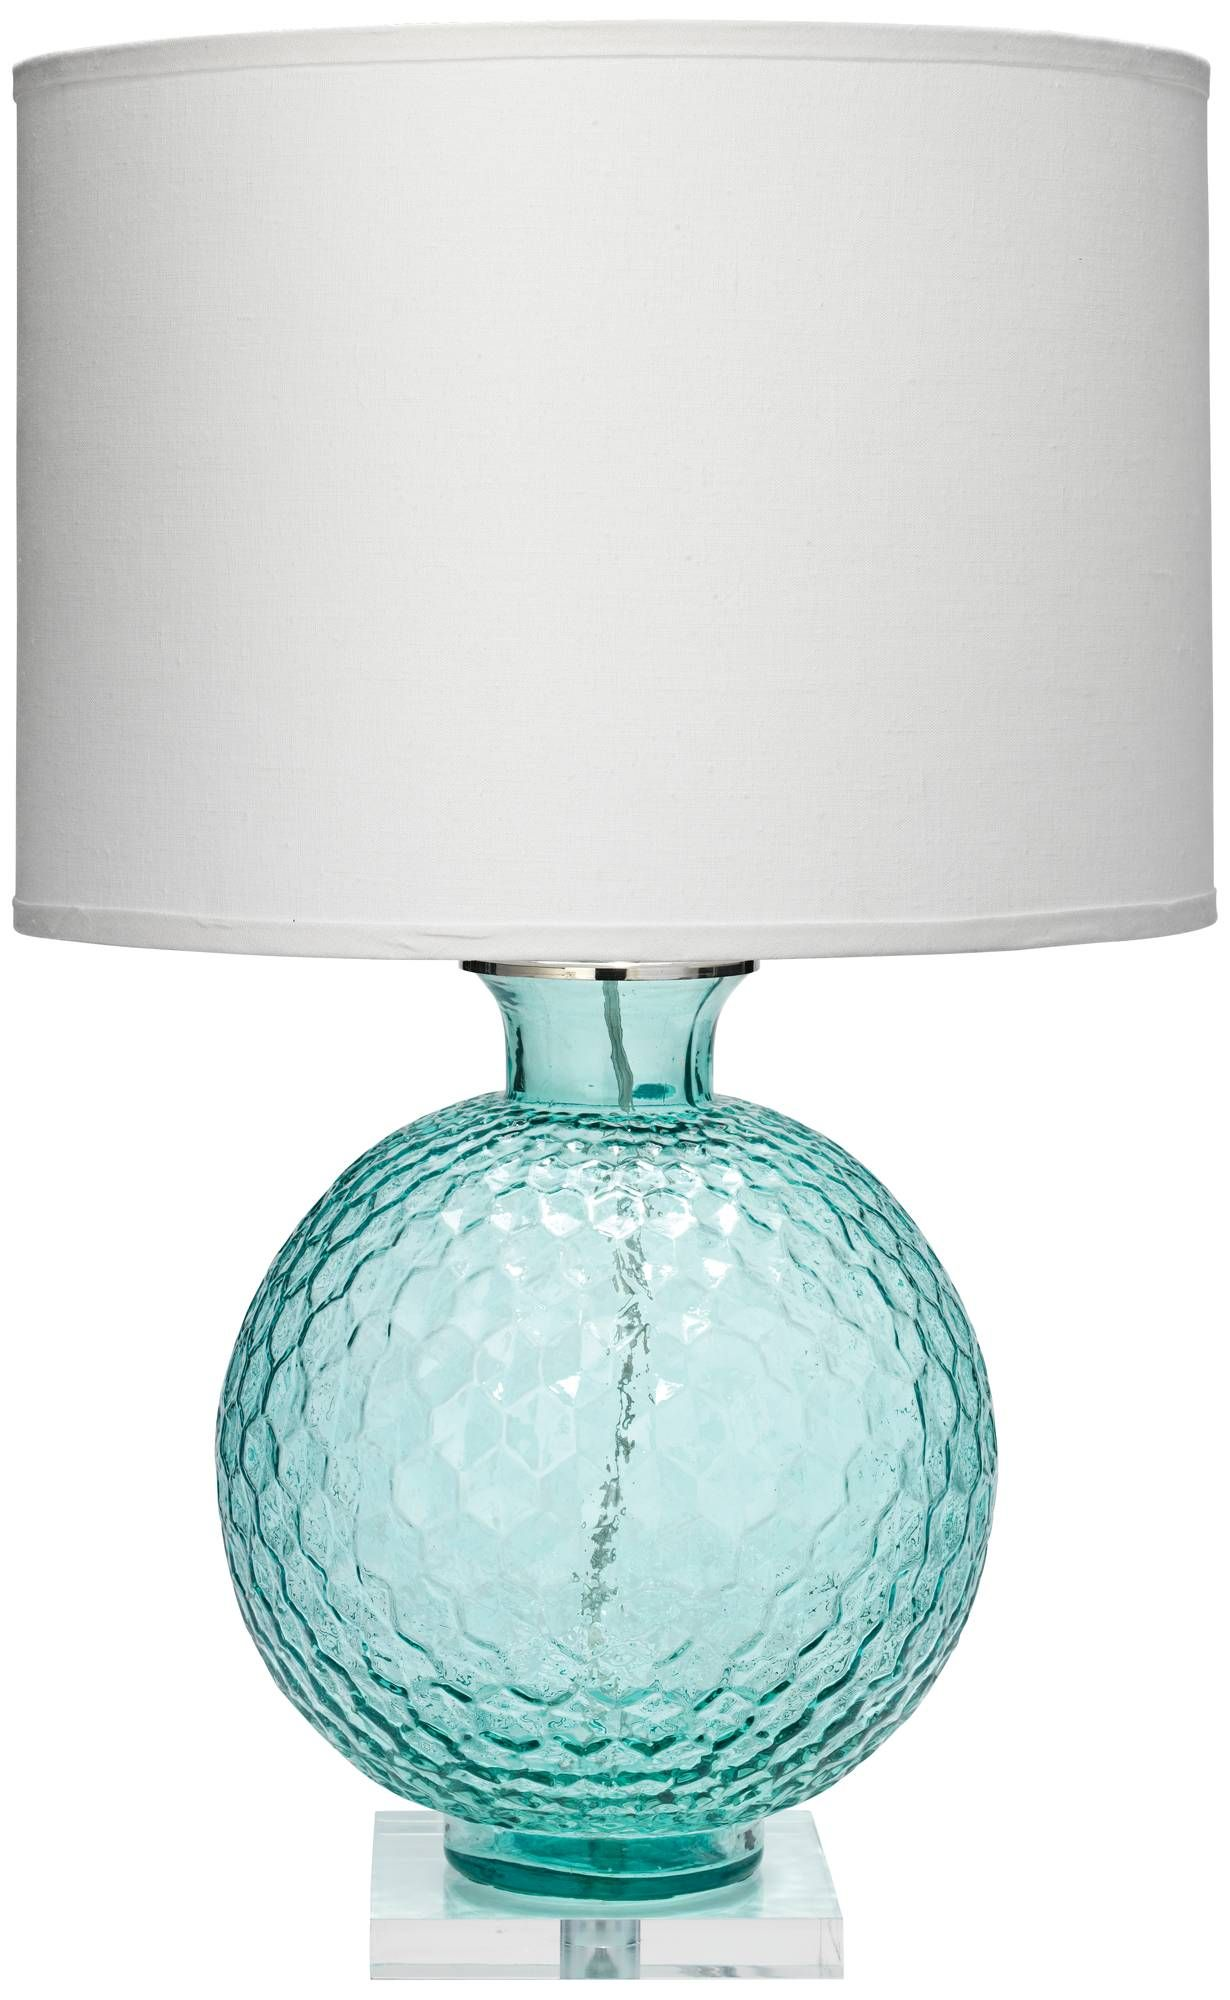 Jamie Young Clark Aqua Blue Glass Table Lamp 7x384 Lamps Plus Glass Table Lamp Turquoise Lamp Table Lamp